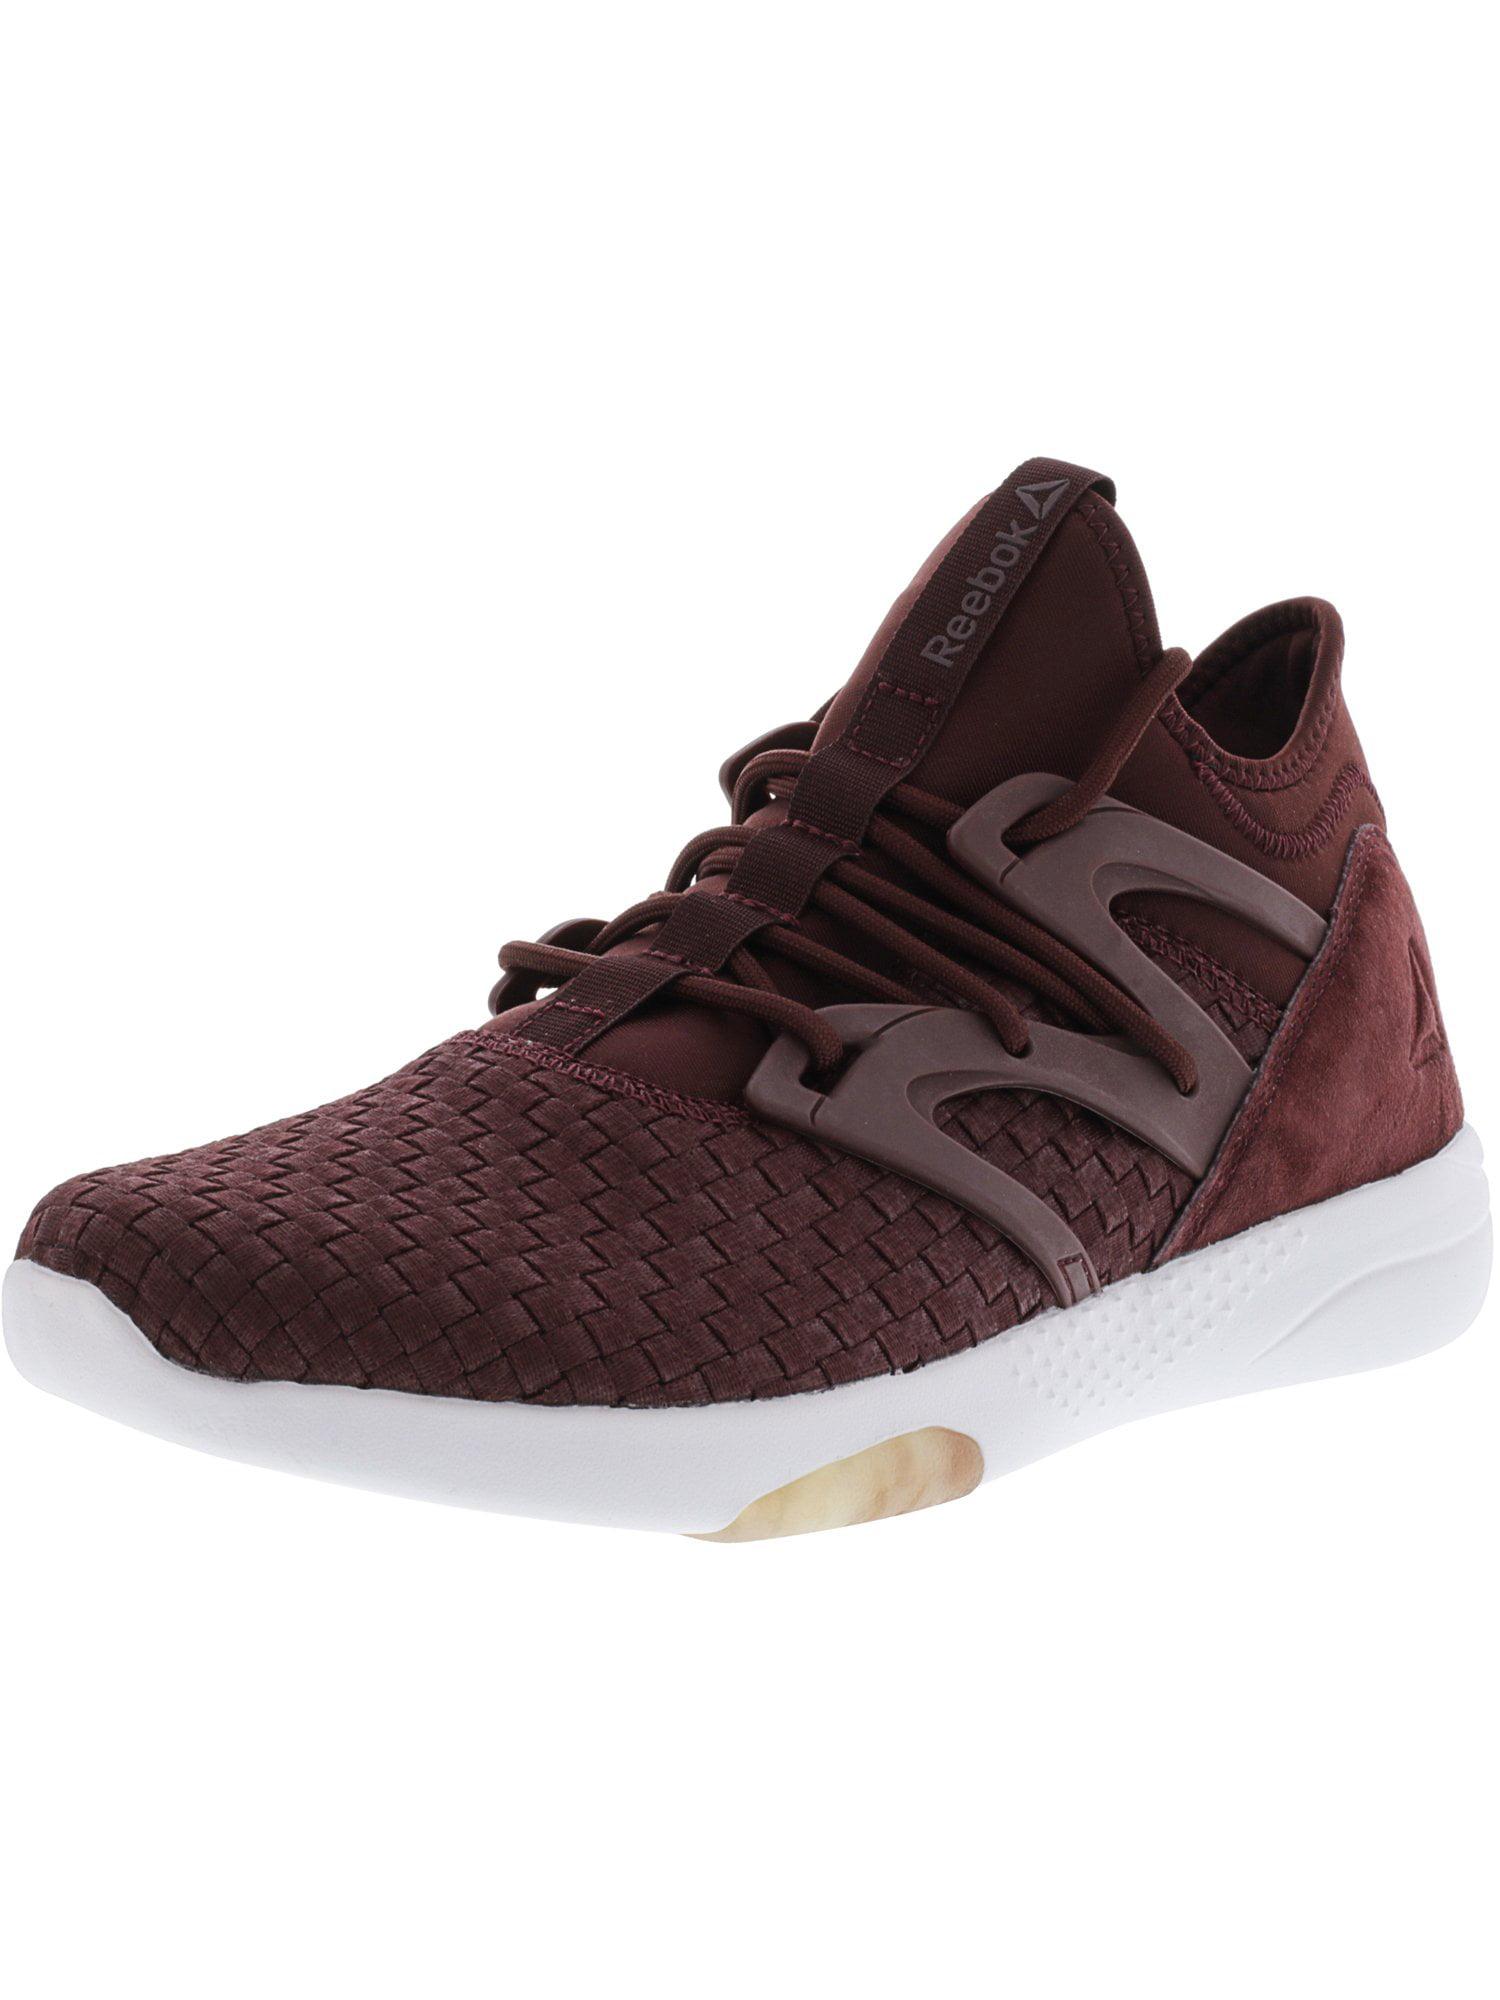 Reebok Hayasu Dance Schuhe Günstig Kaufen, Reebok Dance